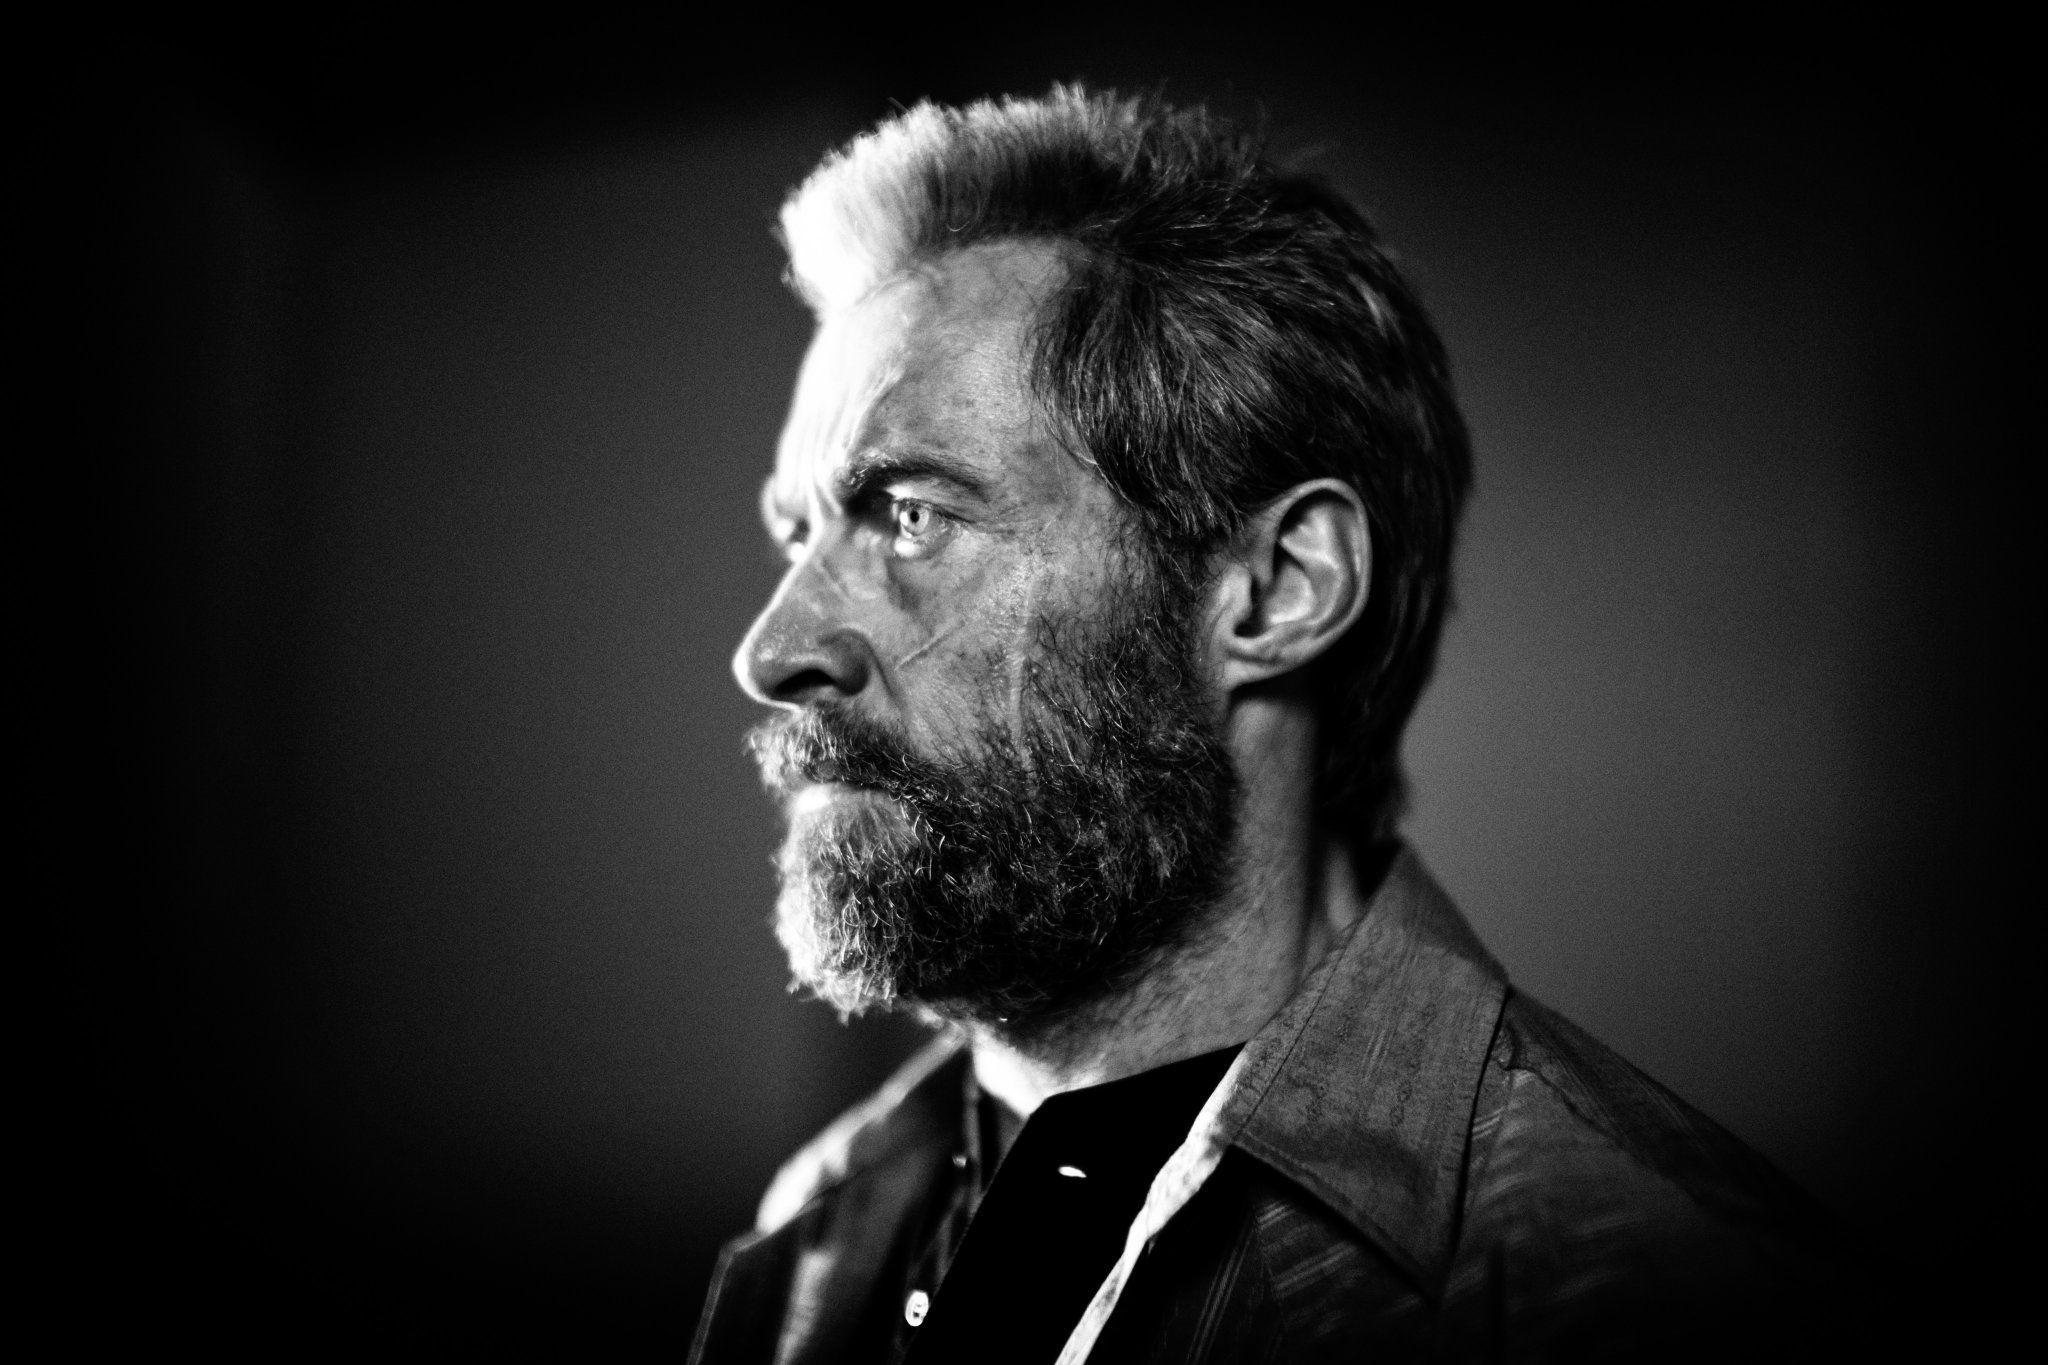 124 Hugh Jackman HD Wallpapers   Backgrounds - Wallpaper Abyss